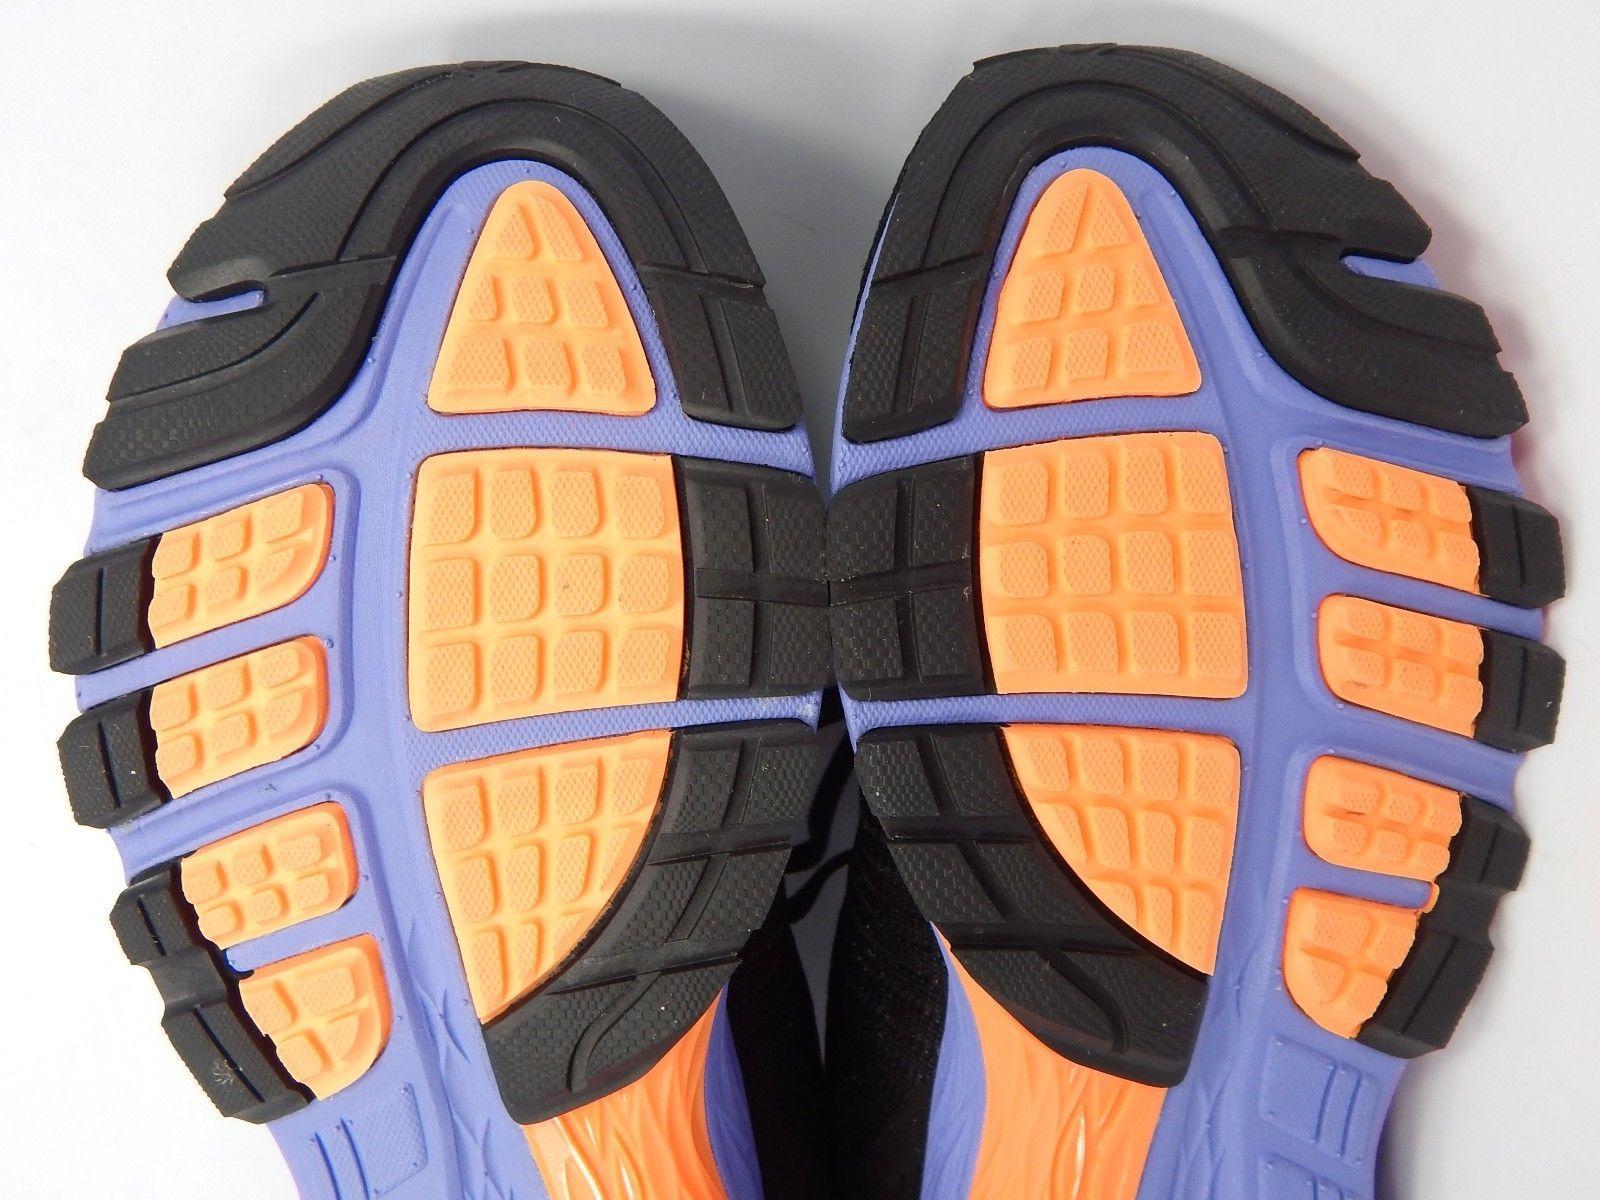 Asics Dynaflyte Size US 9.5 M (B) EU 41.5 Women's Running Shoes Black T7D5N